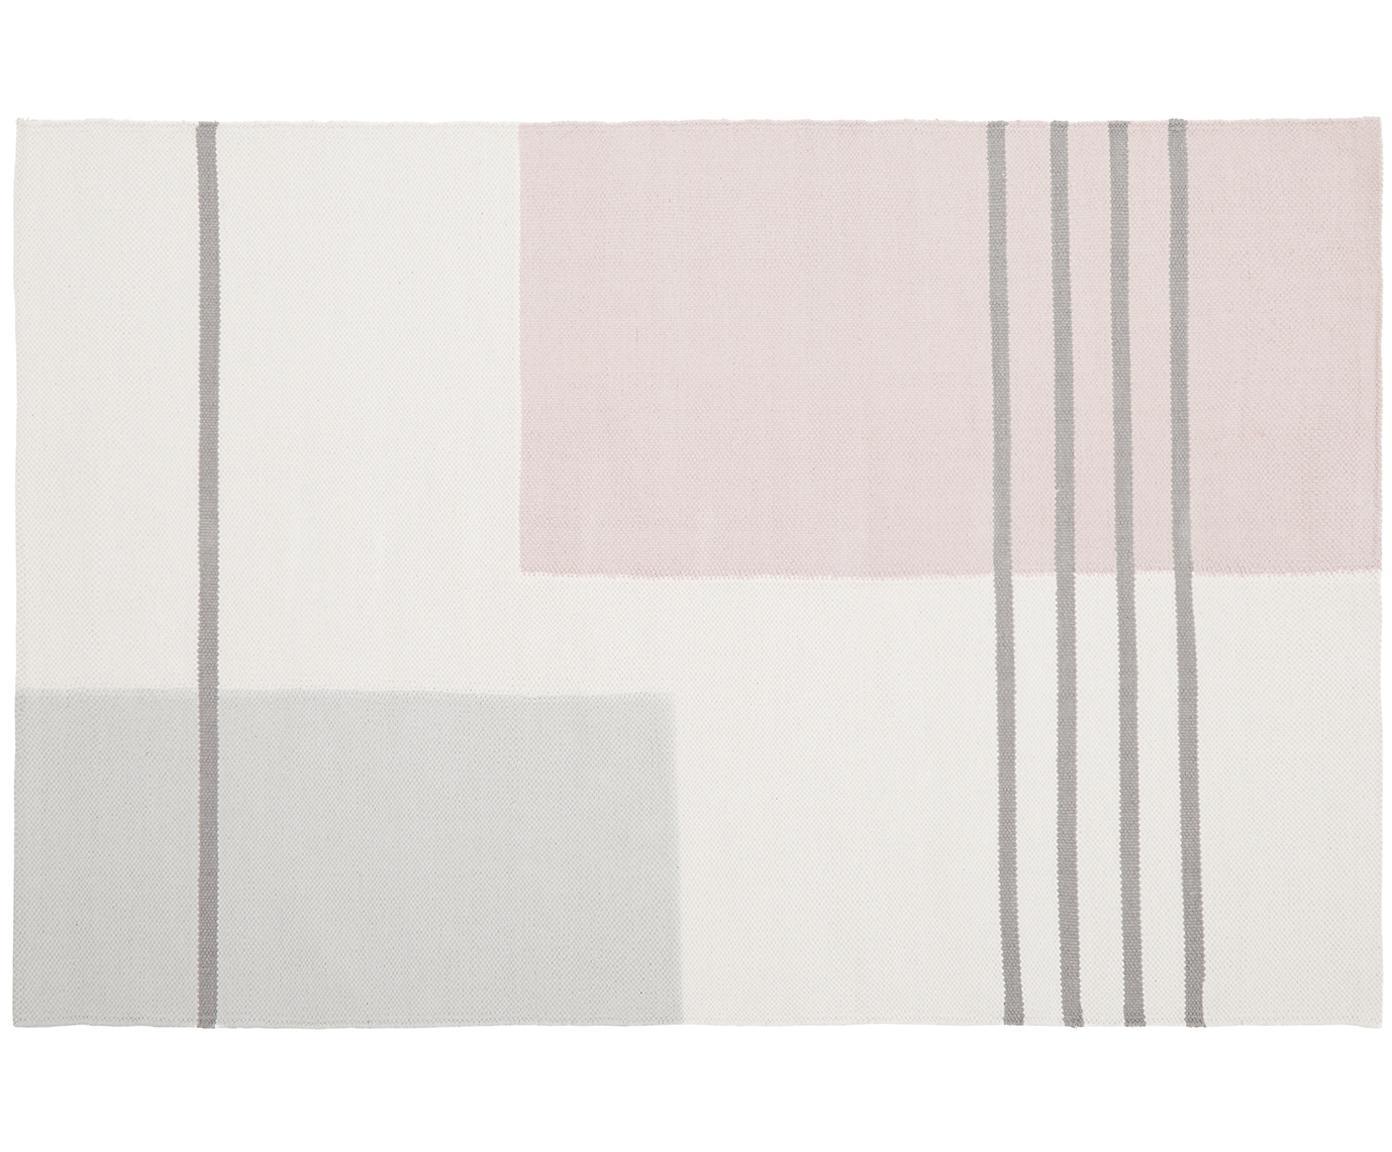 Alfombra artesanal de algodón Georgio, Algodón, Gris, beige, rosa, An 120 x L 180 cm